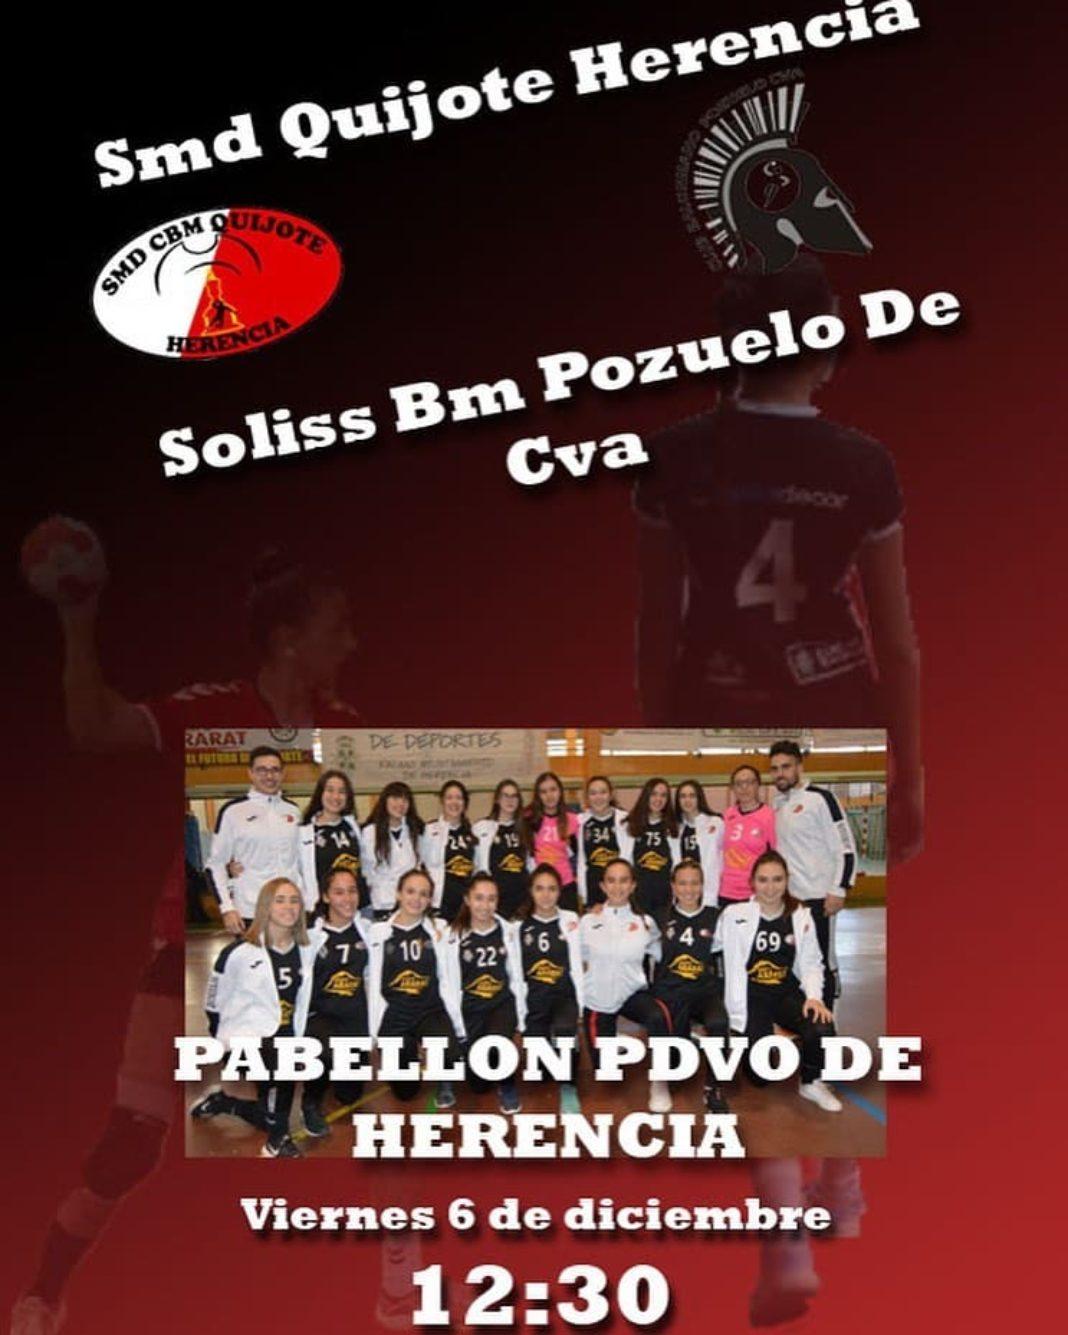 sms quijote herencia vs soliss bm pozuelo cva 1068x1335 - SMD Quijote Herencia frente al Soliss Bm Pozuelo de Cva este 6 de diciembre